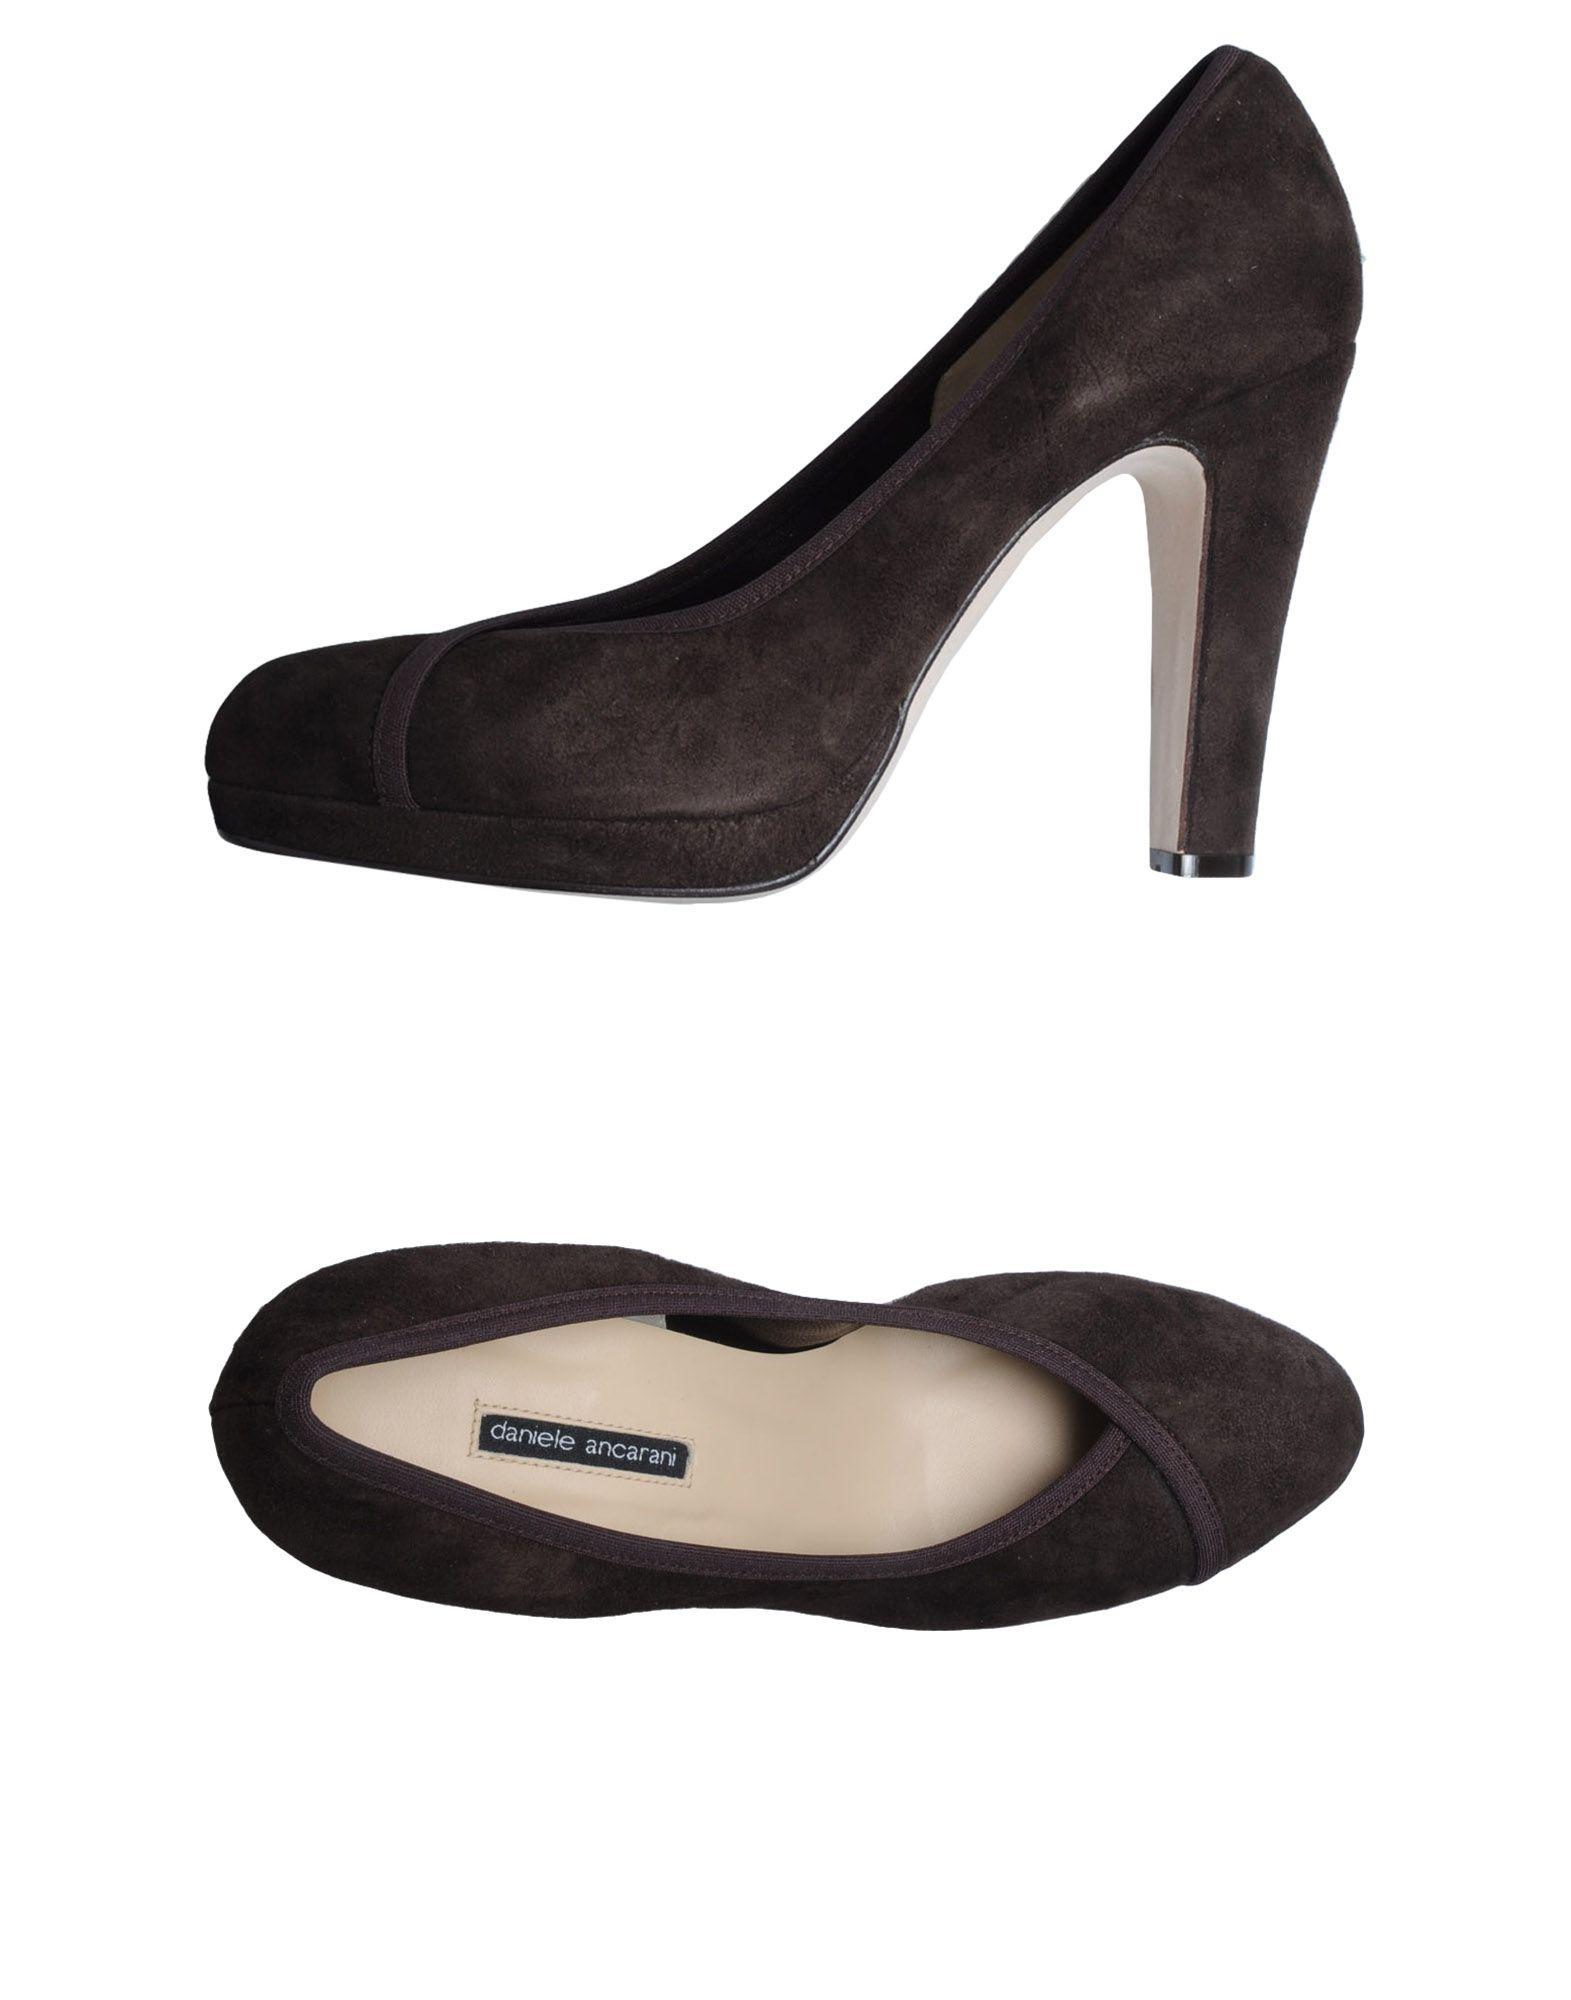 Фото - DANIELE ANCARANI Туфли на платформе обувь на высокой платформе dkny